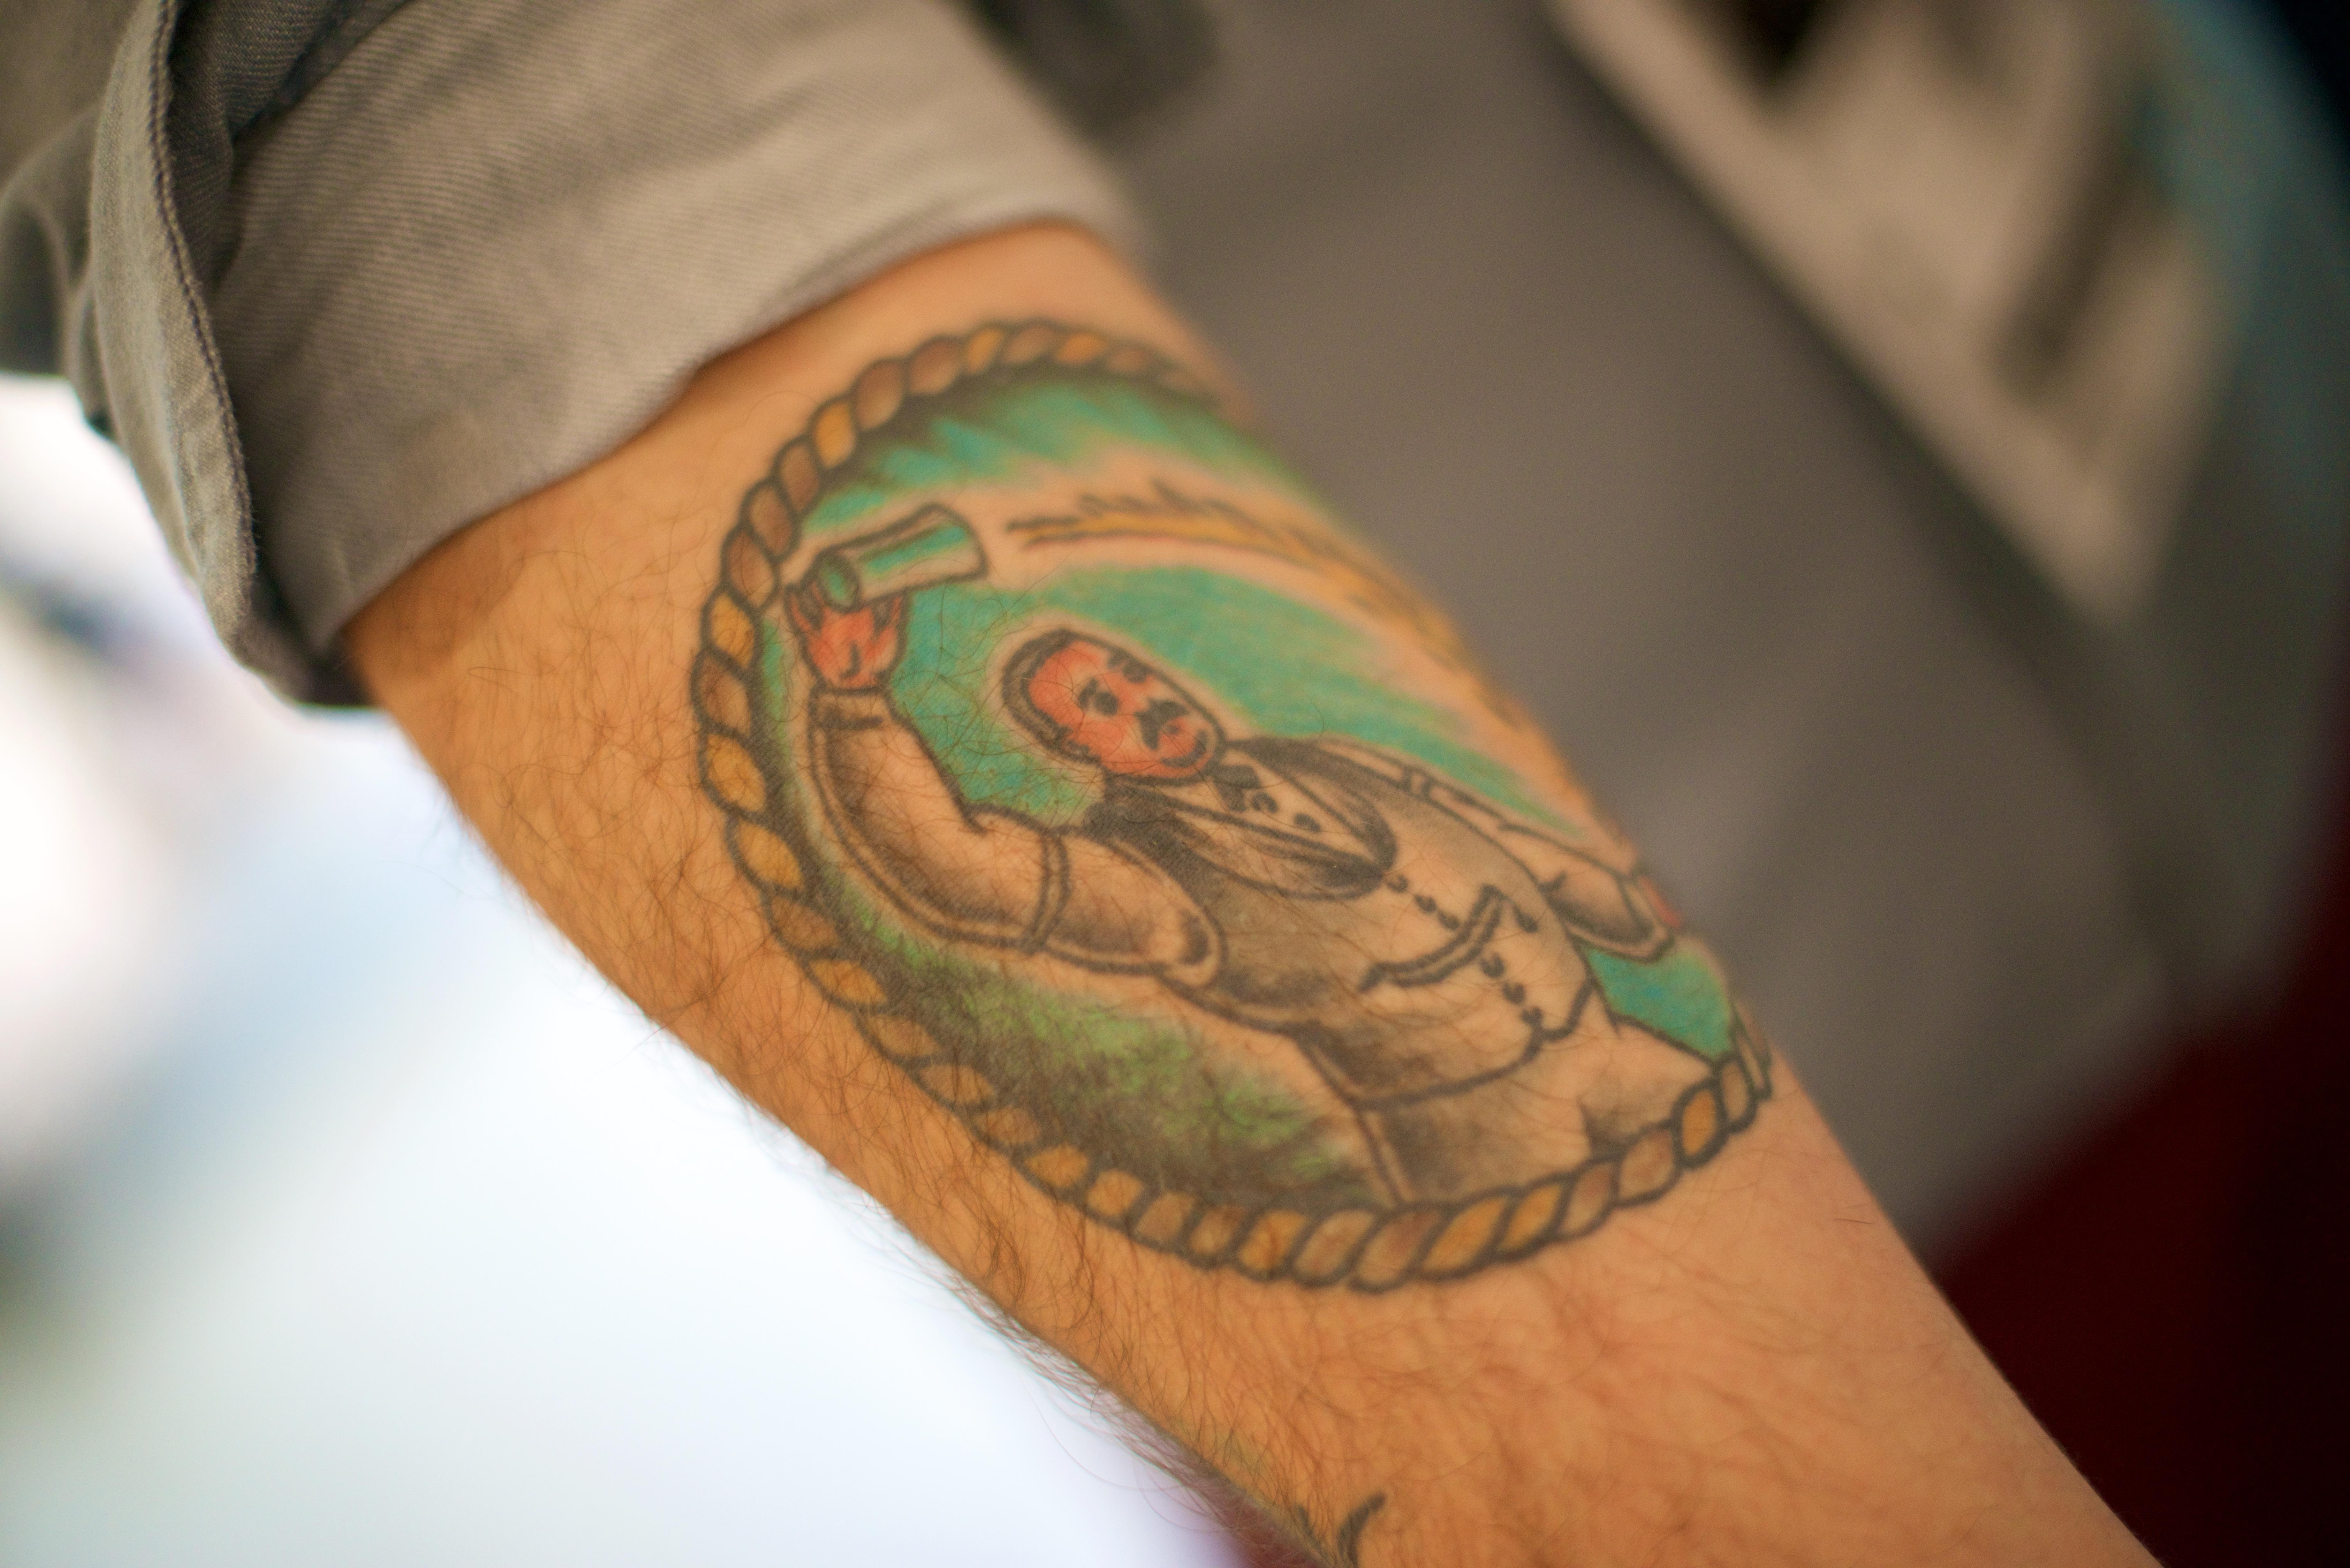 Bartending Tattoos